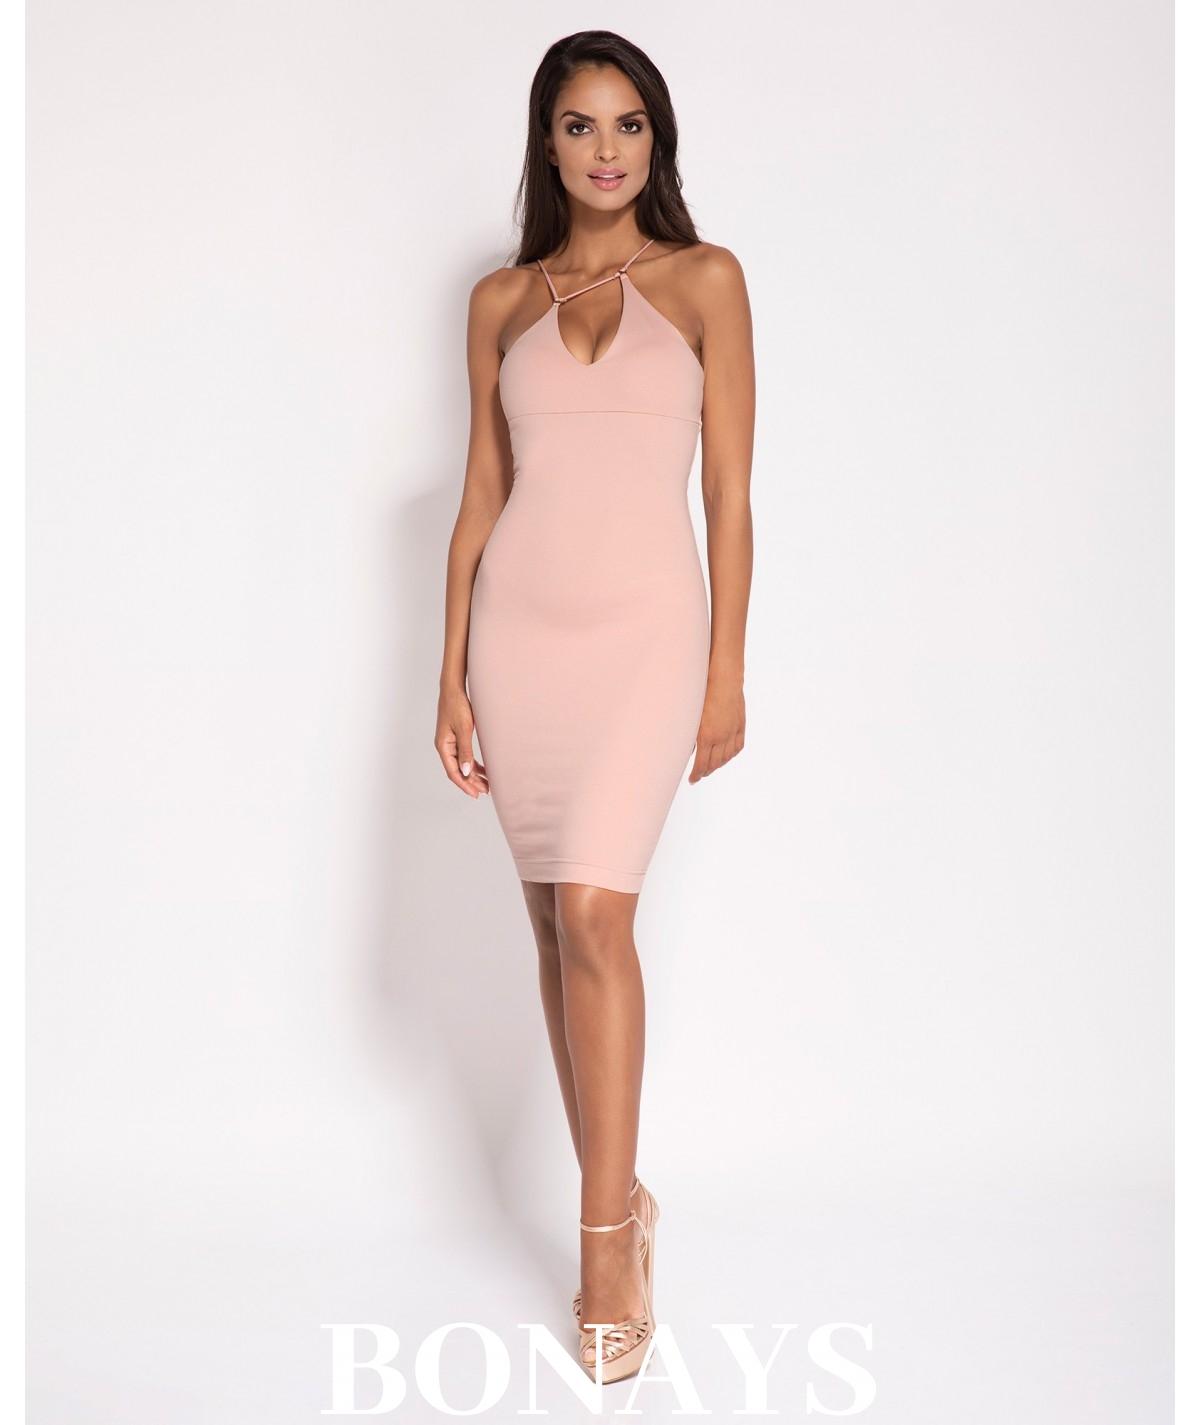 Różowa seksowna sukienka damska Sila - Dursi